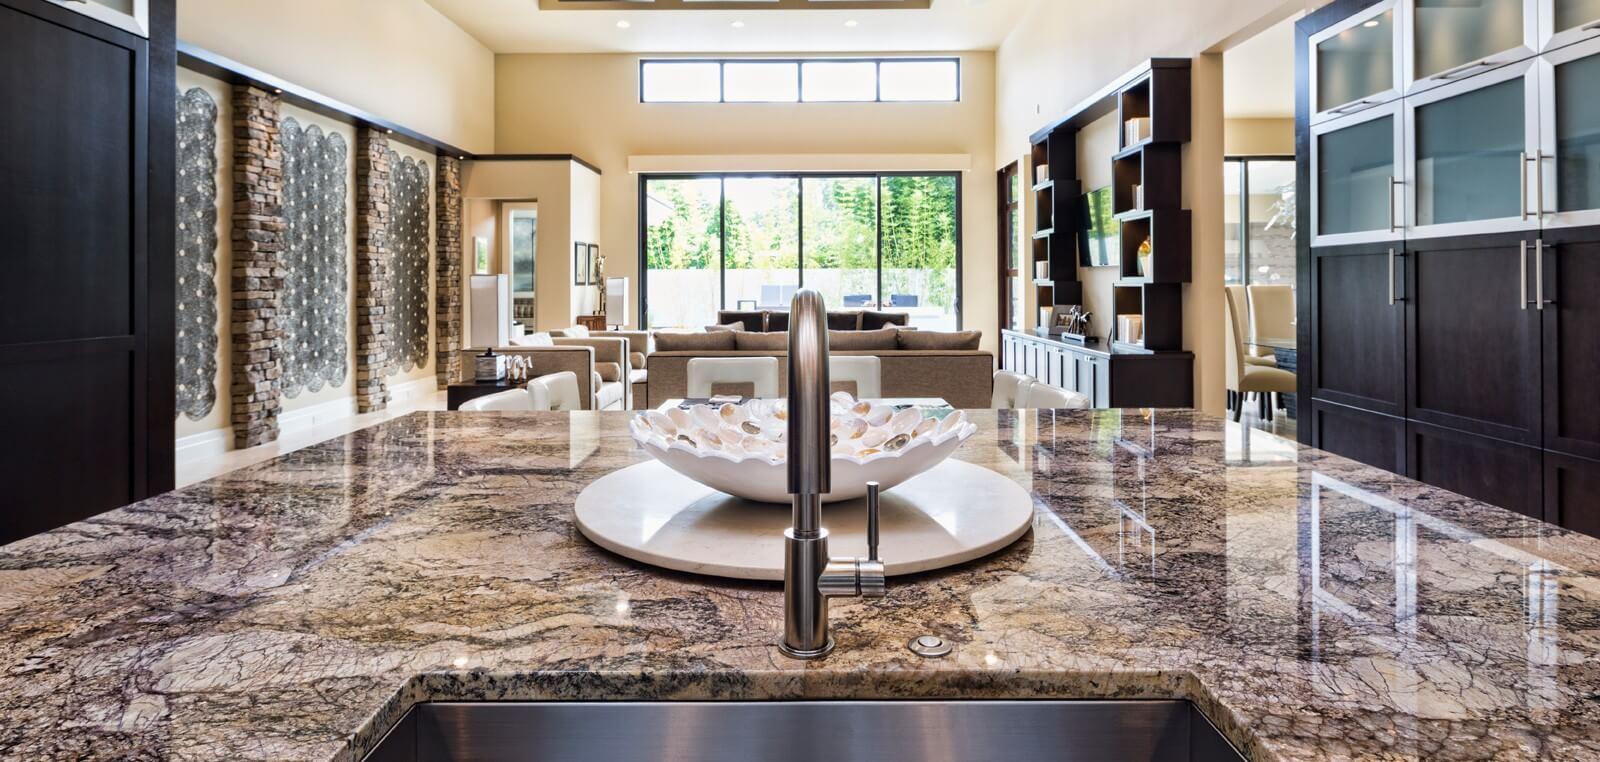 Surprising Southlake Homes For Sale Keller Tx Homes For Sale Home Interior And Landscaping Spoatsignezvosmurscom